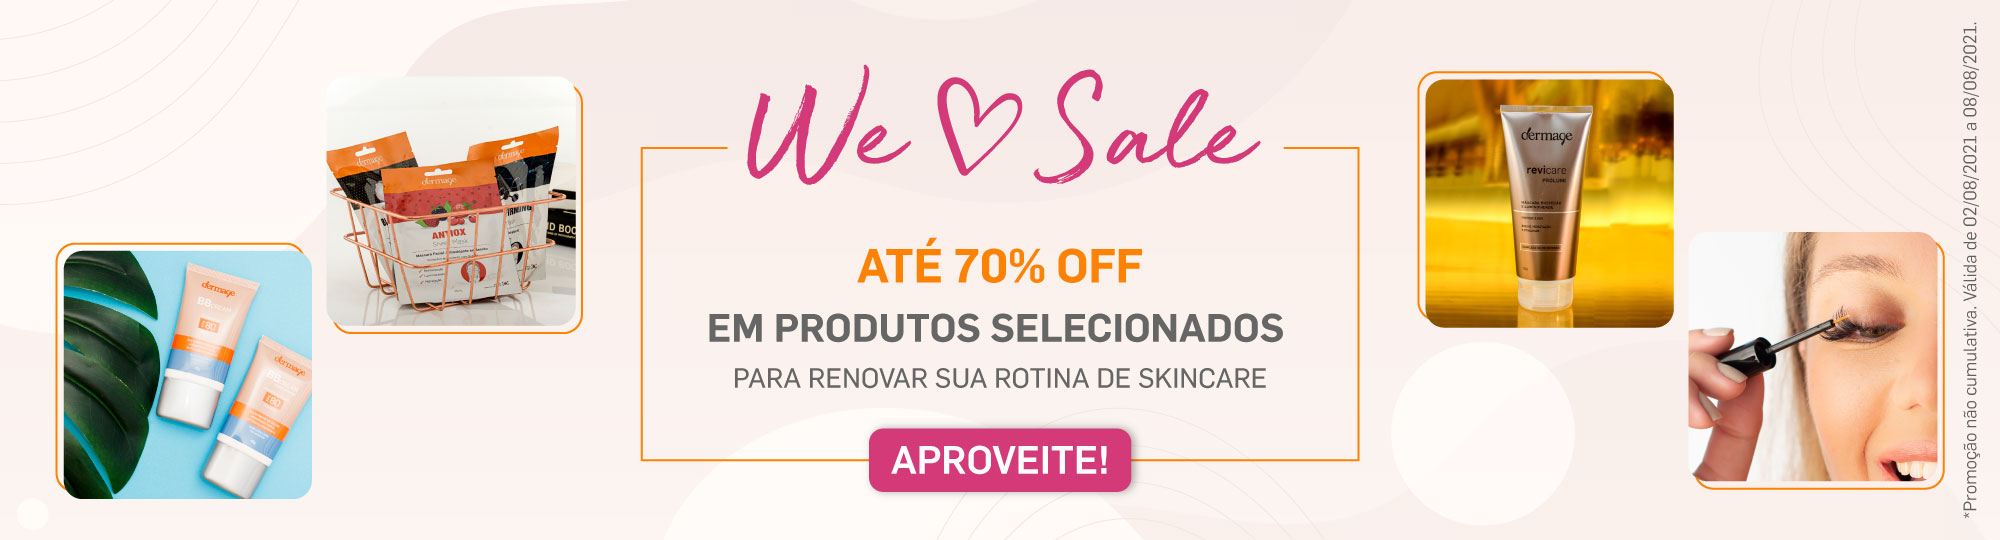 we S2 sale